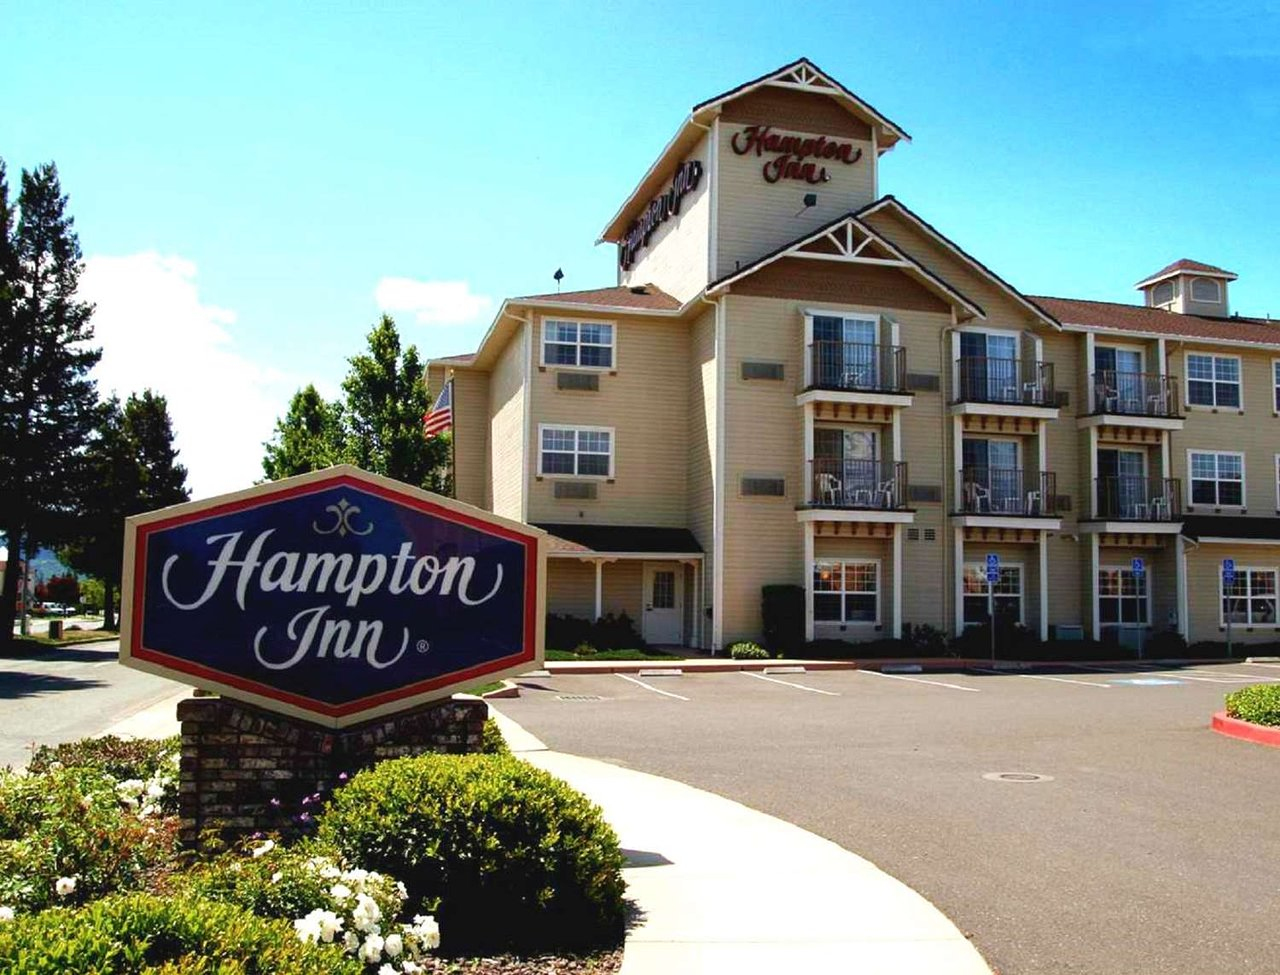 hampton inn ukiah 130 2 4 2 updated 2019 prices hotel rh tripadvisor com